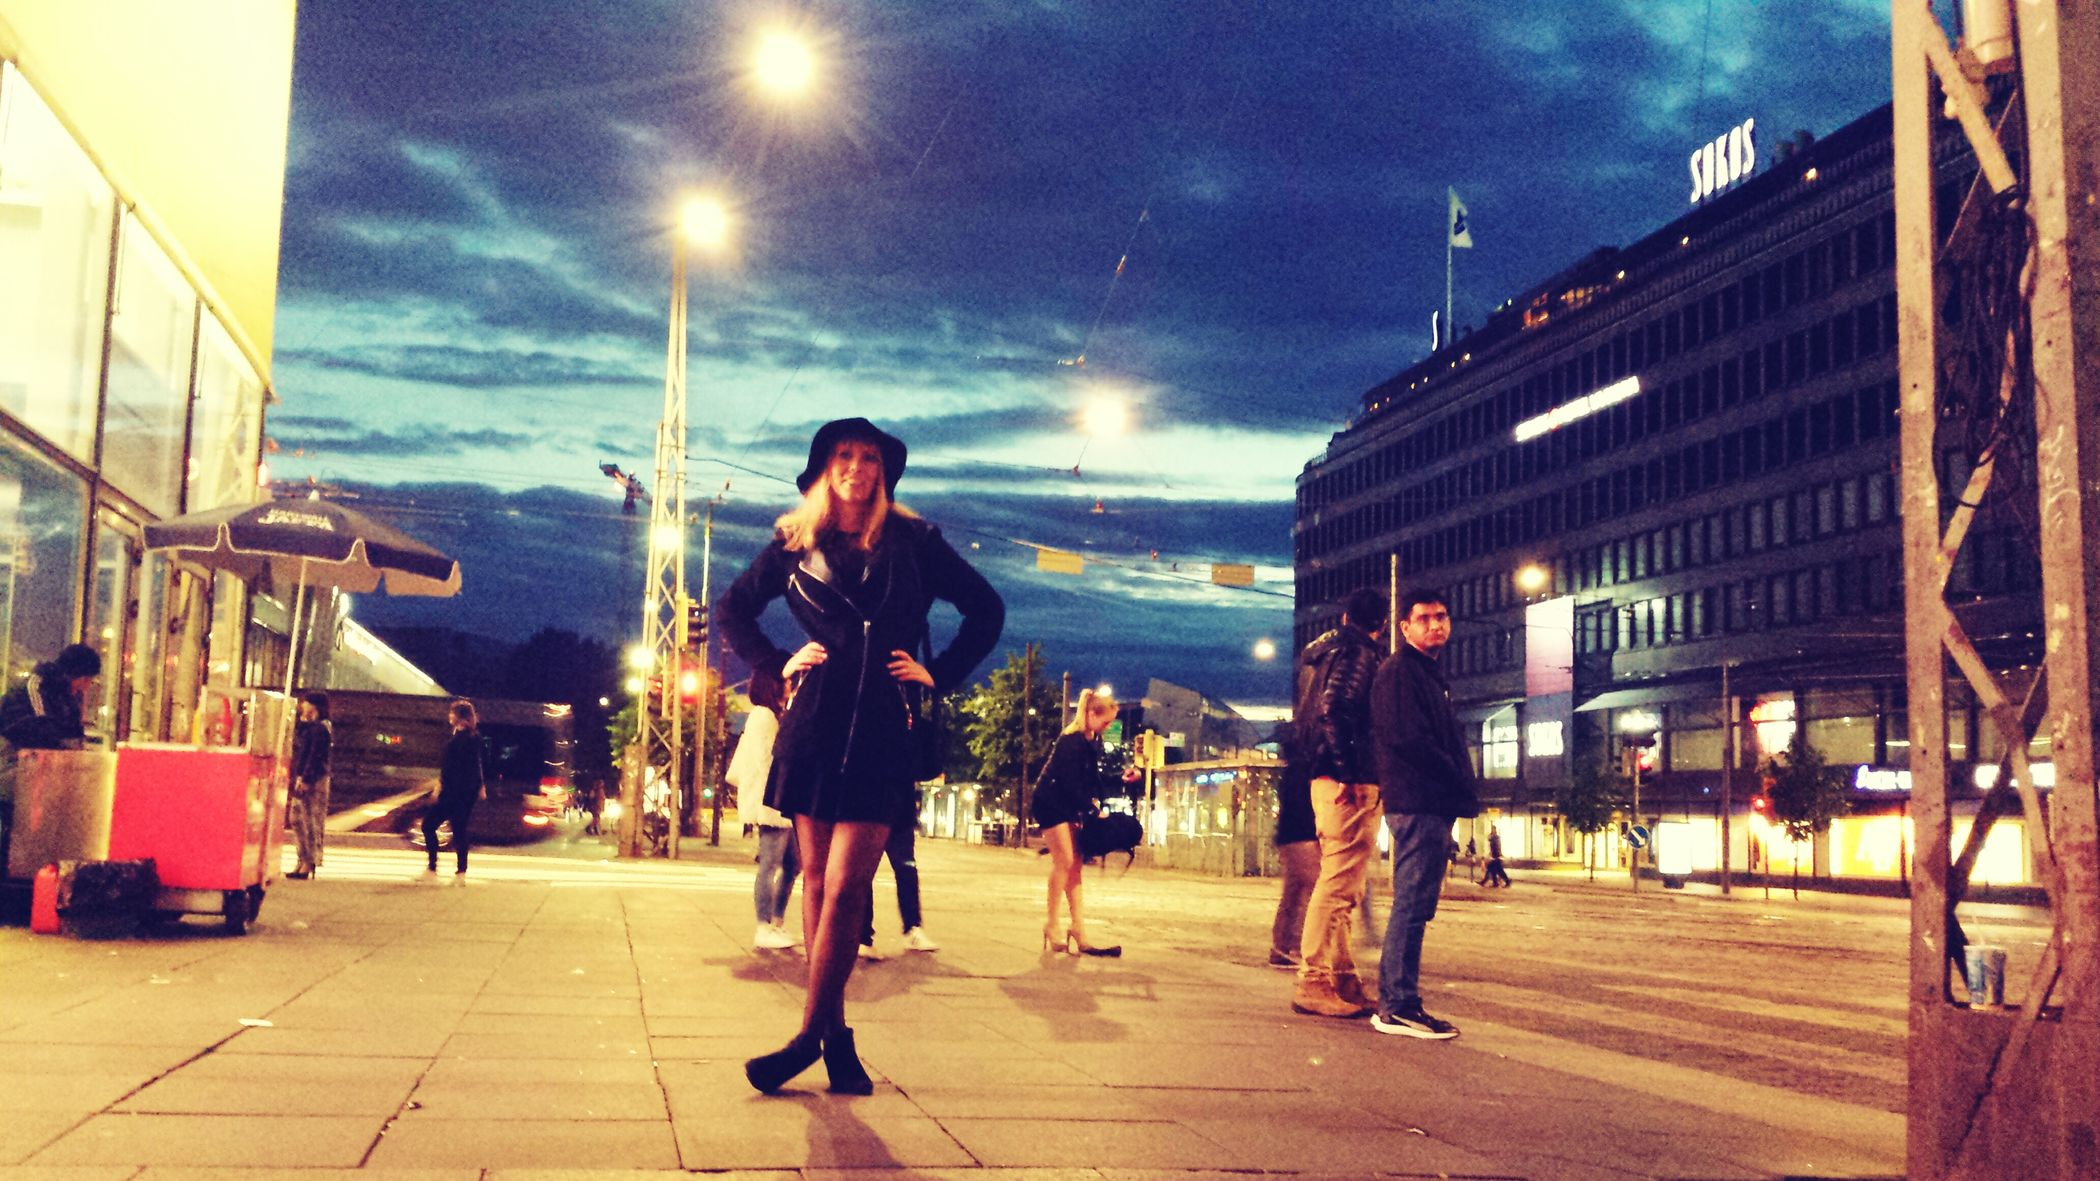 Helsinki Finland Holiday Midnight Sun Midsummer Urbanchic My Style Summer